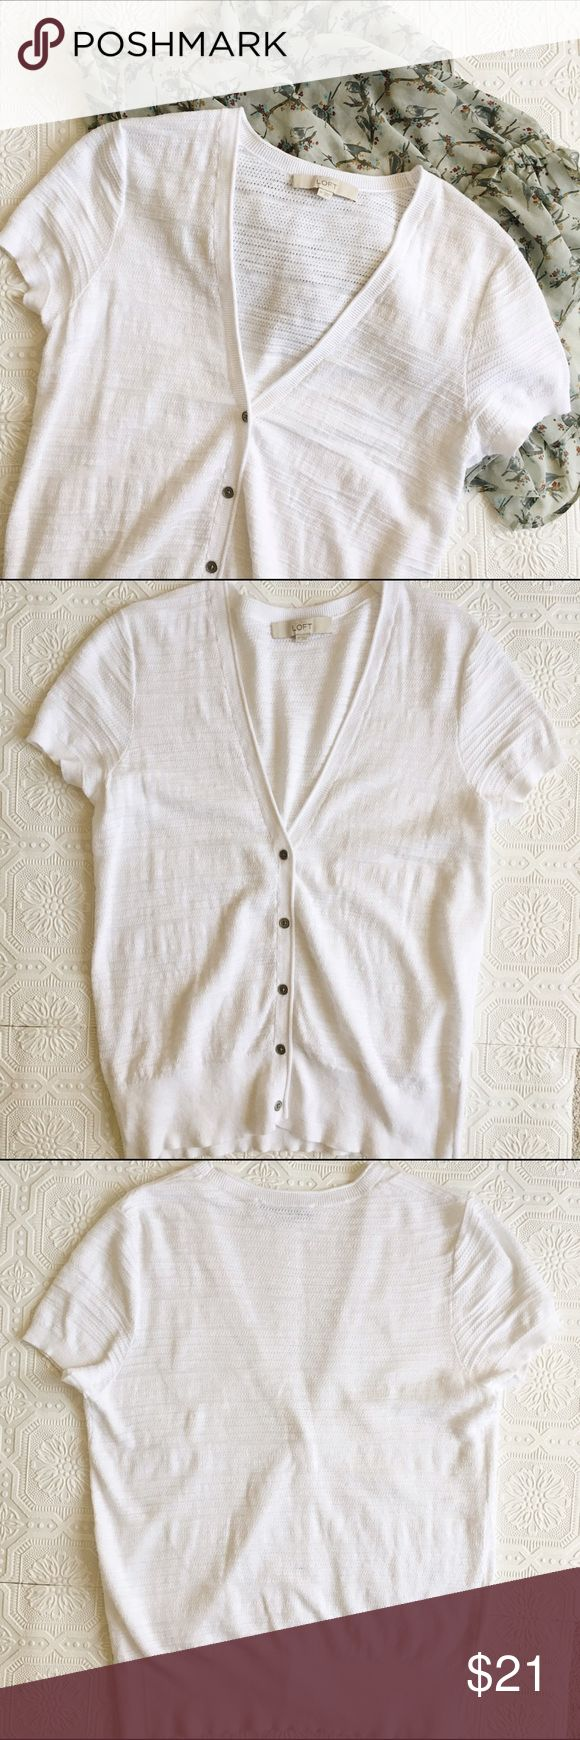 LOFT V Neck Cardigan Ann Taylor LOFT V neck cardigan in like new condition! Short sleeved. Silver buttons. LOFT Sweaters Cardigans